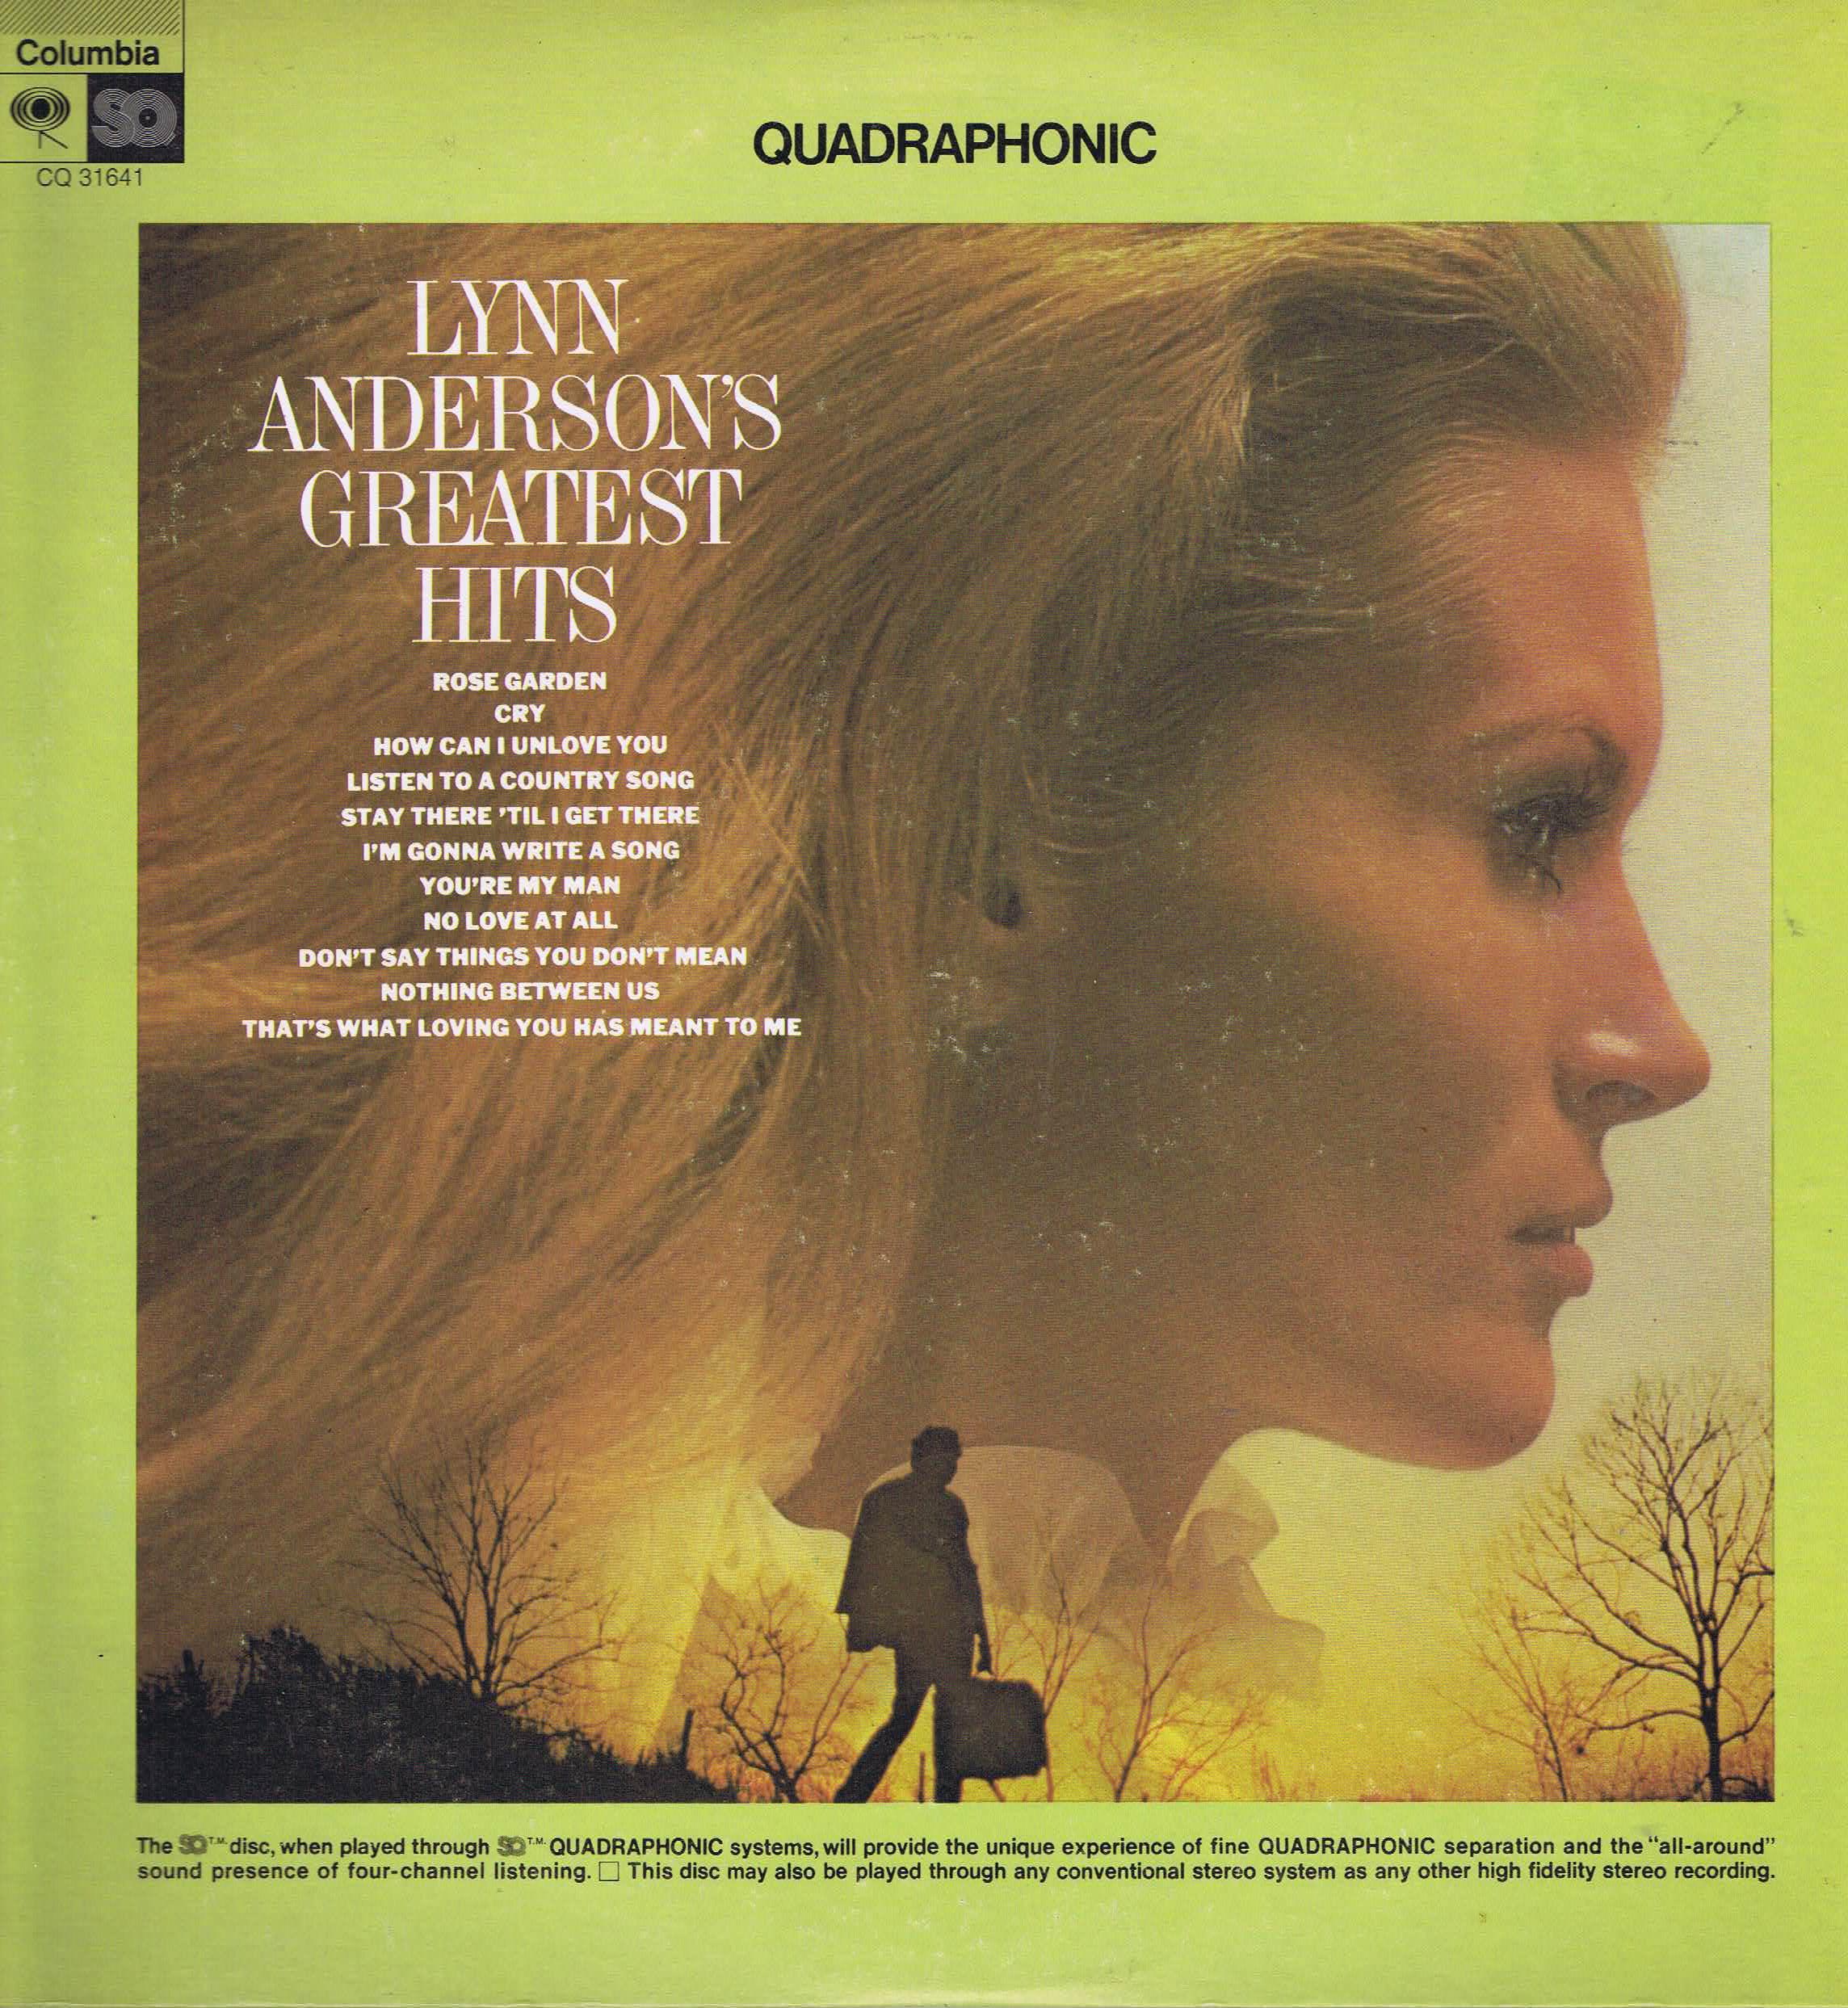 Lynn Anderson\'s Greatest Hits - CQ 31641 - Quadraphonic LP Vinyl ...